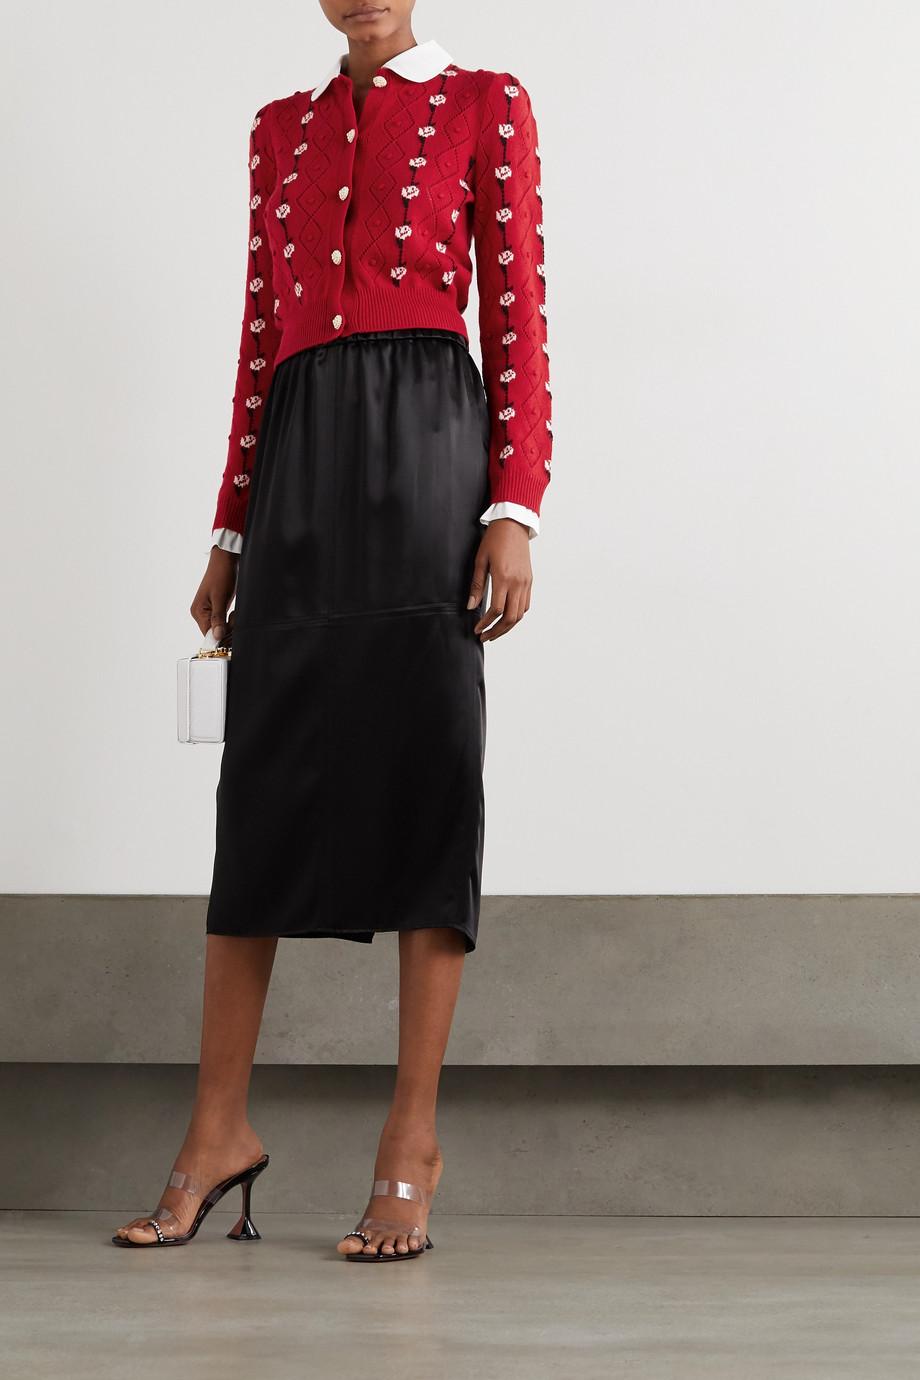 Miu Miu Cotton-trimmed cashmere-jacquard cardigan